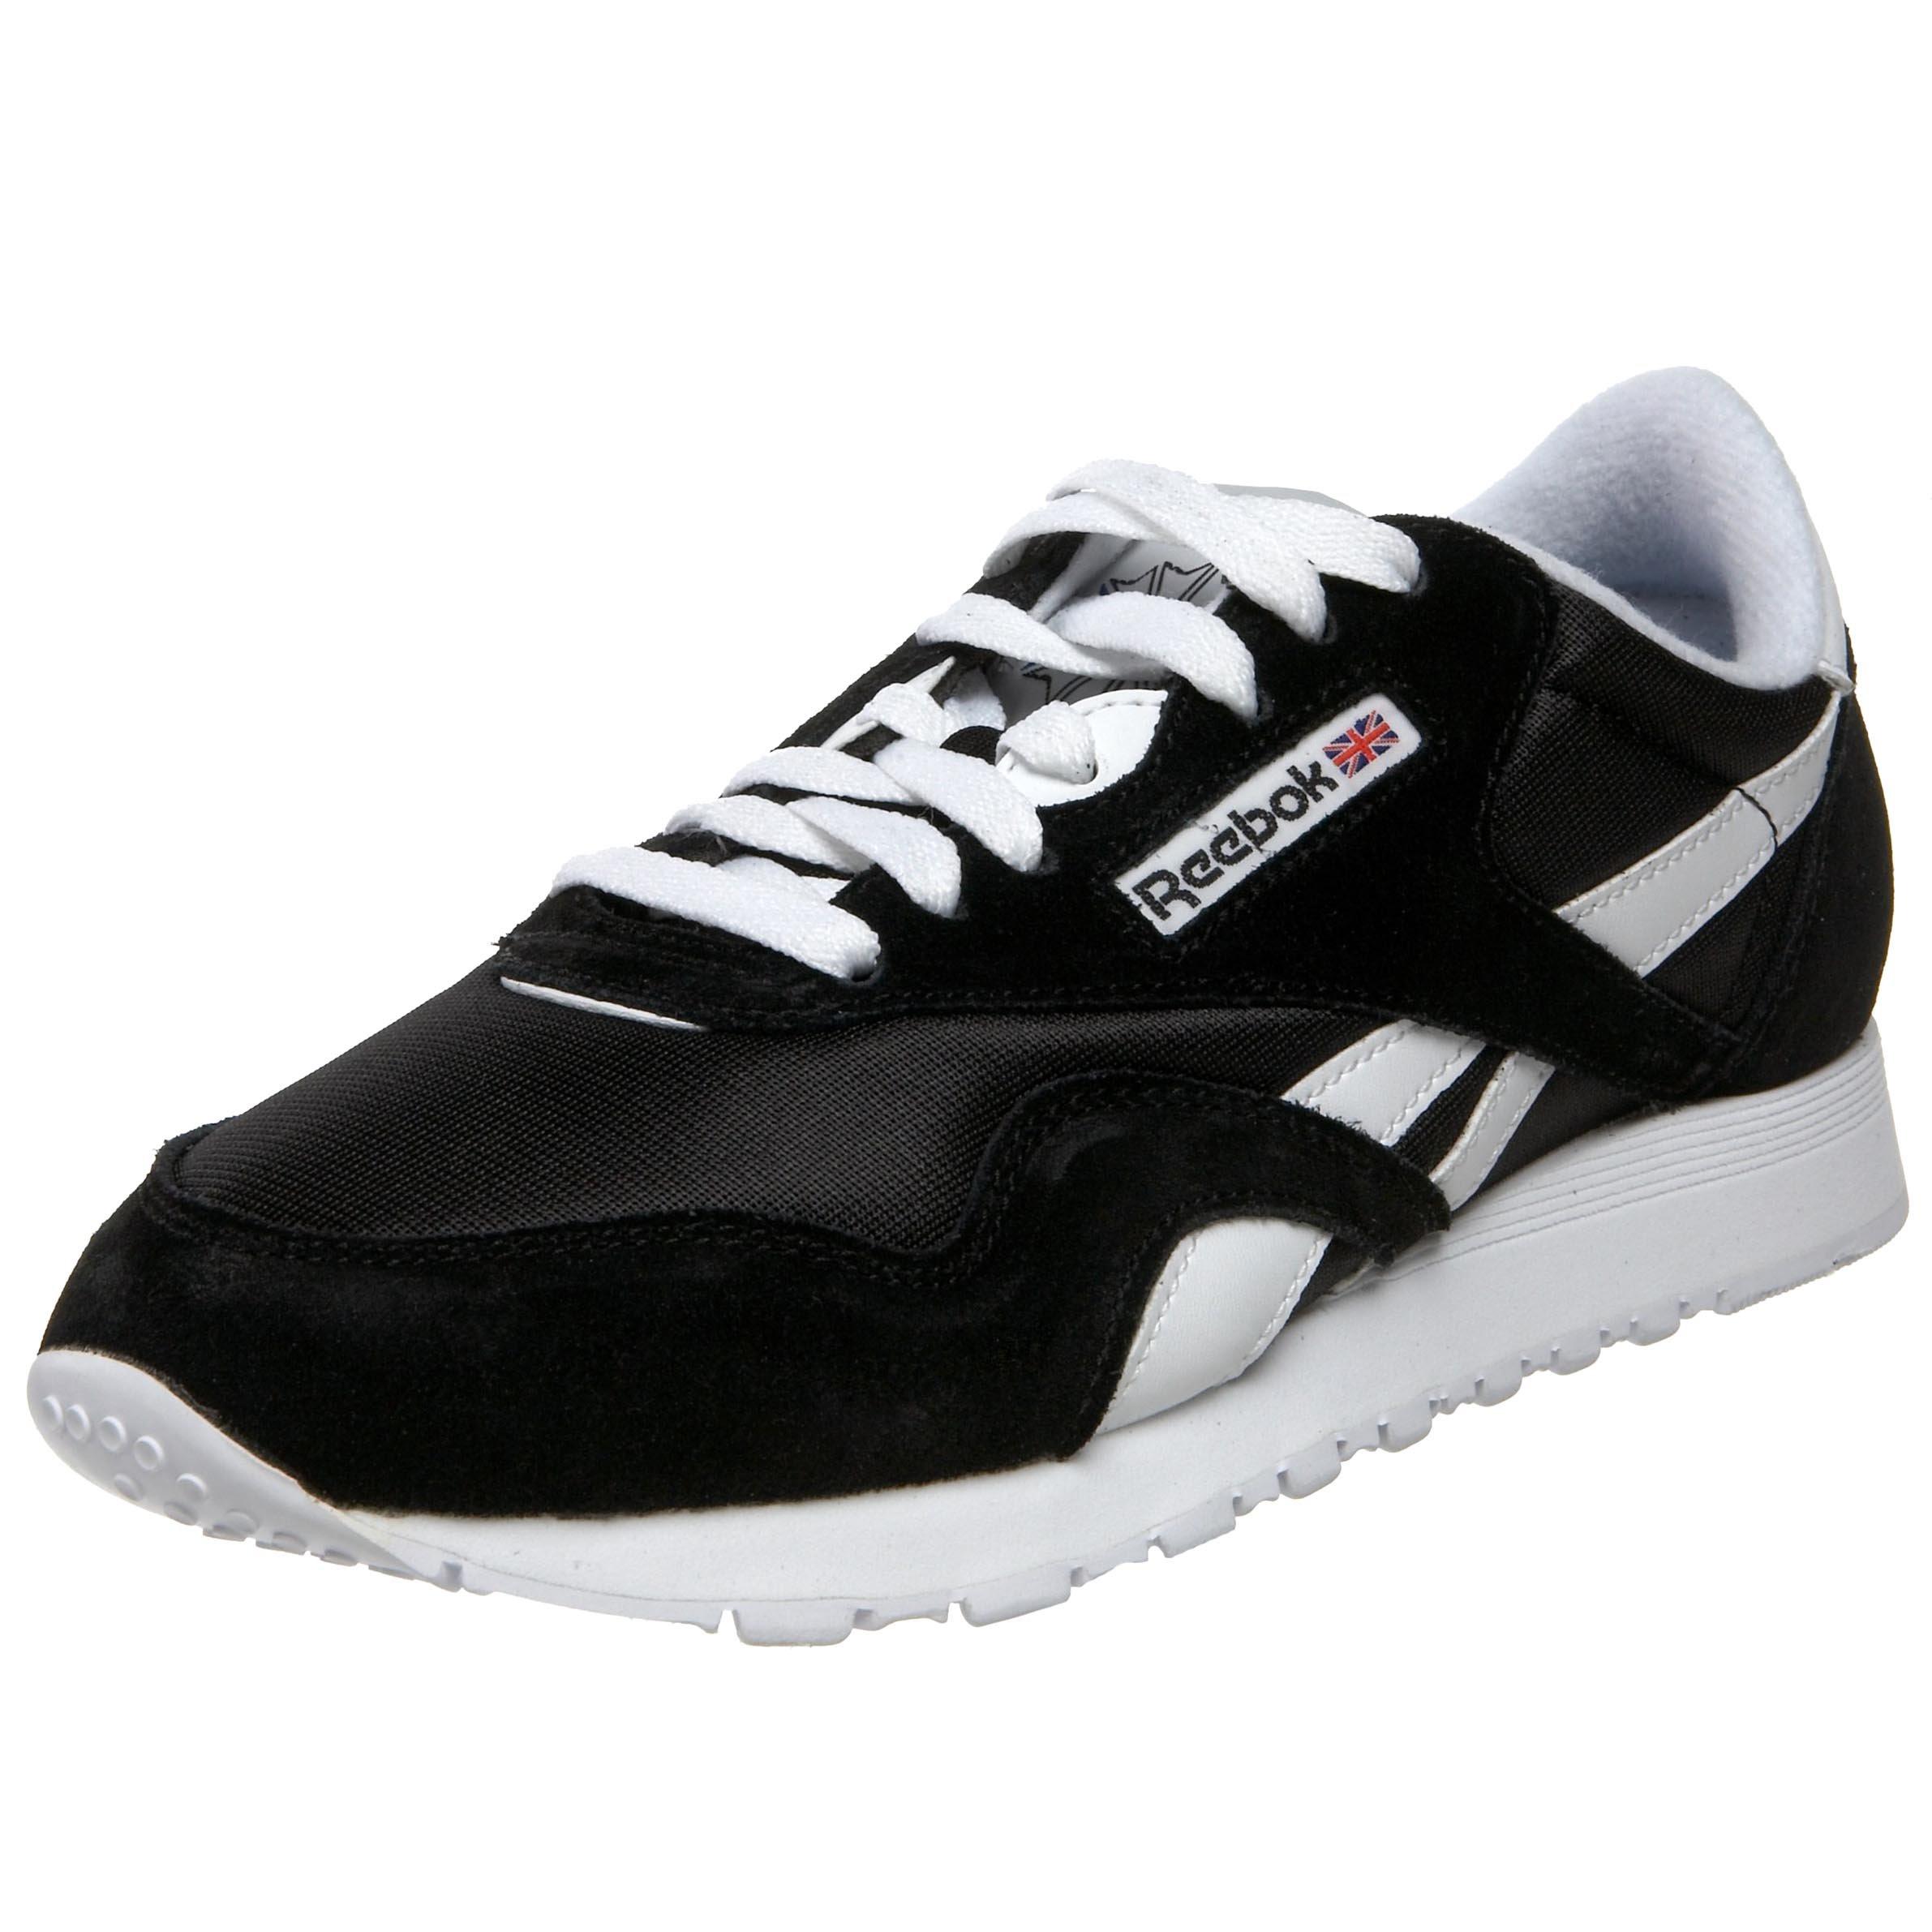 Reebok Women's Classic Nylon Sneaker, Black/White, 7 M US